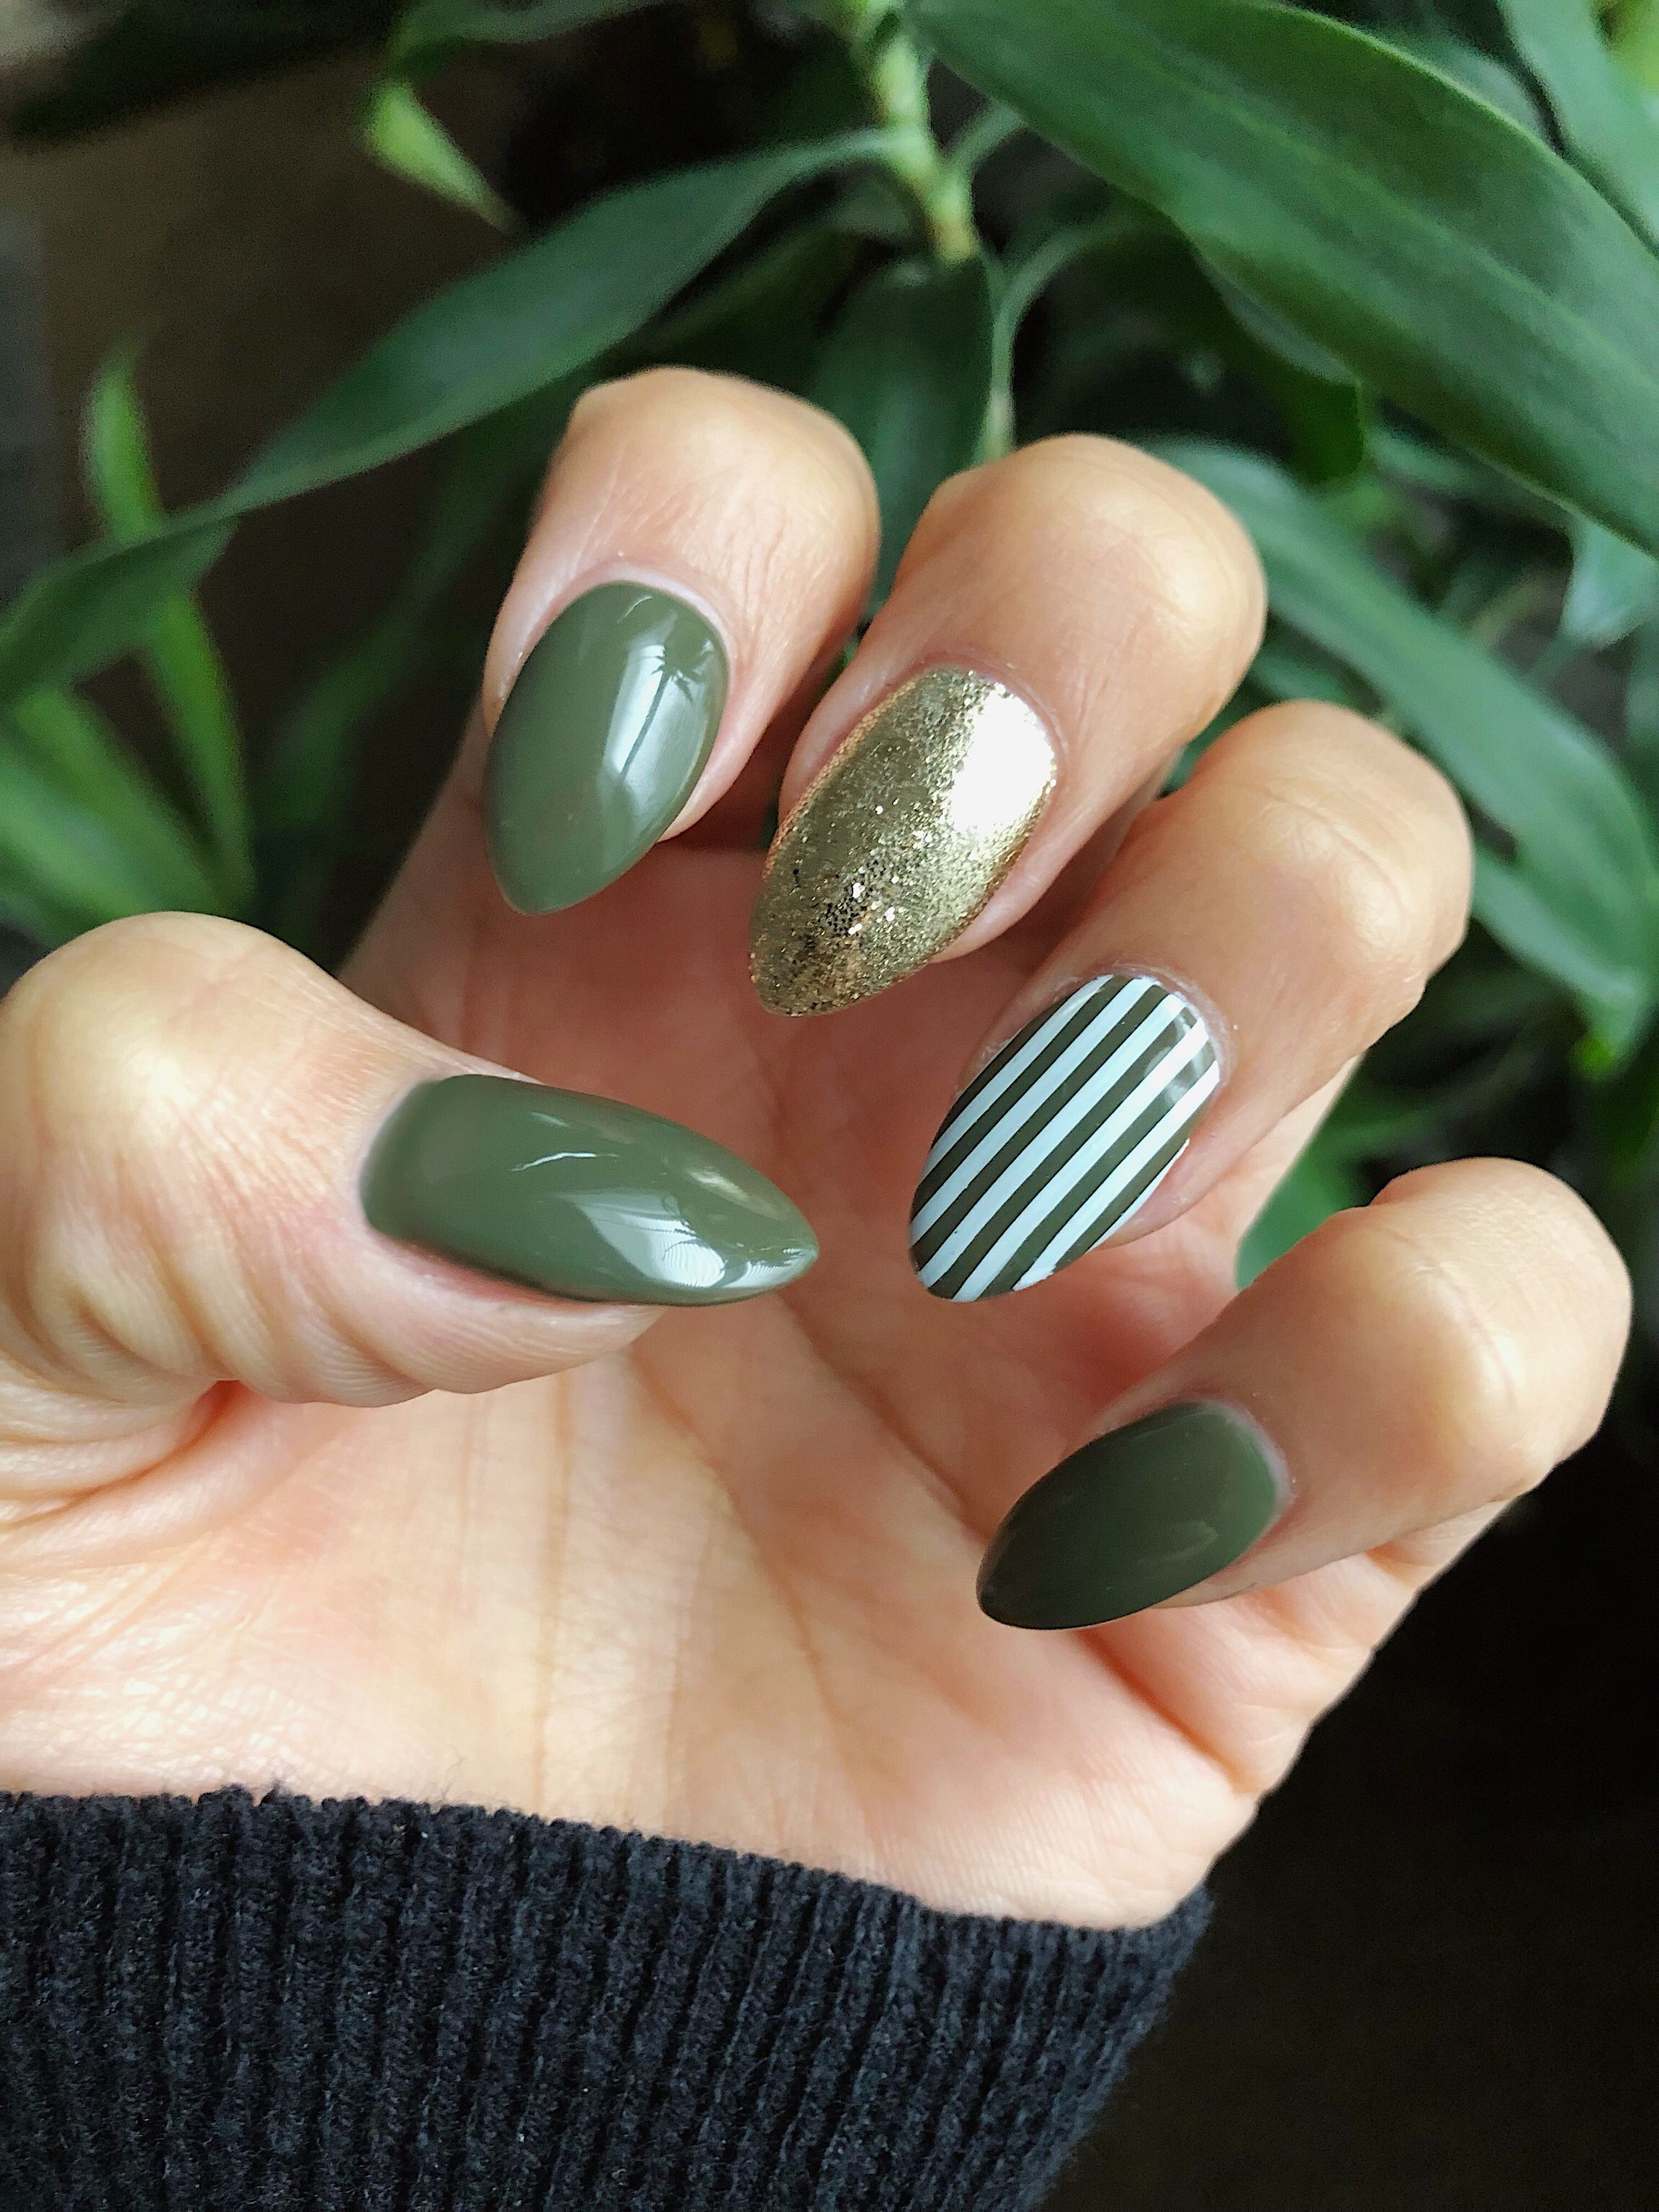 Army green almond nails #nails #winternails | Nails | Pinterest ...